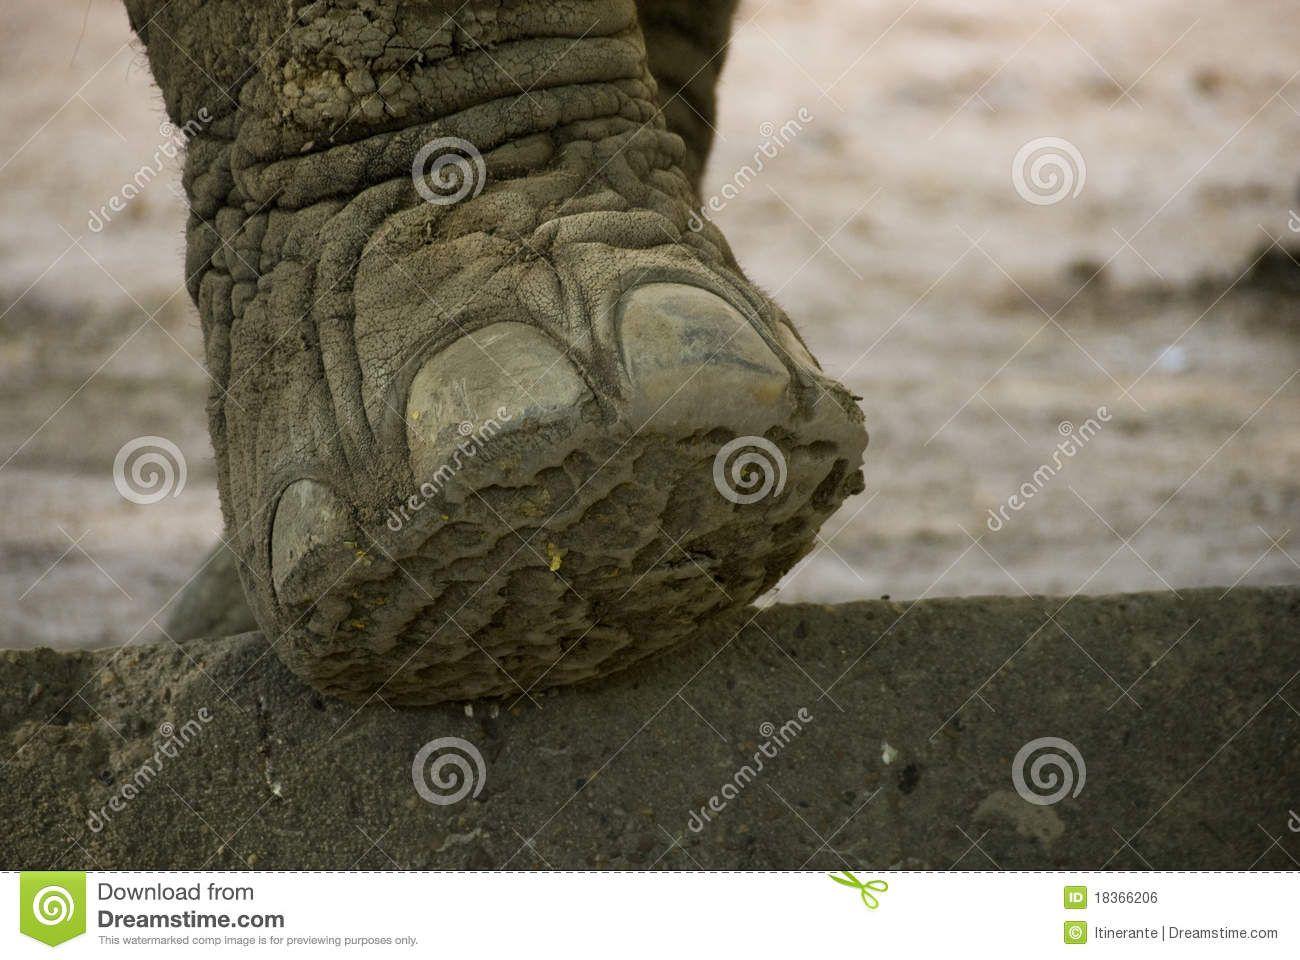 elephant-foot-18366206.jpg (1300×960) | Proboscidea Anatomy ...